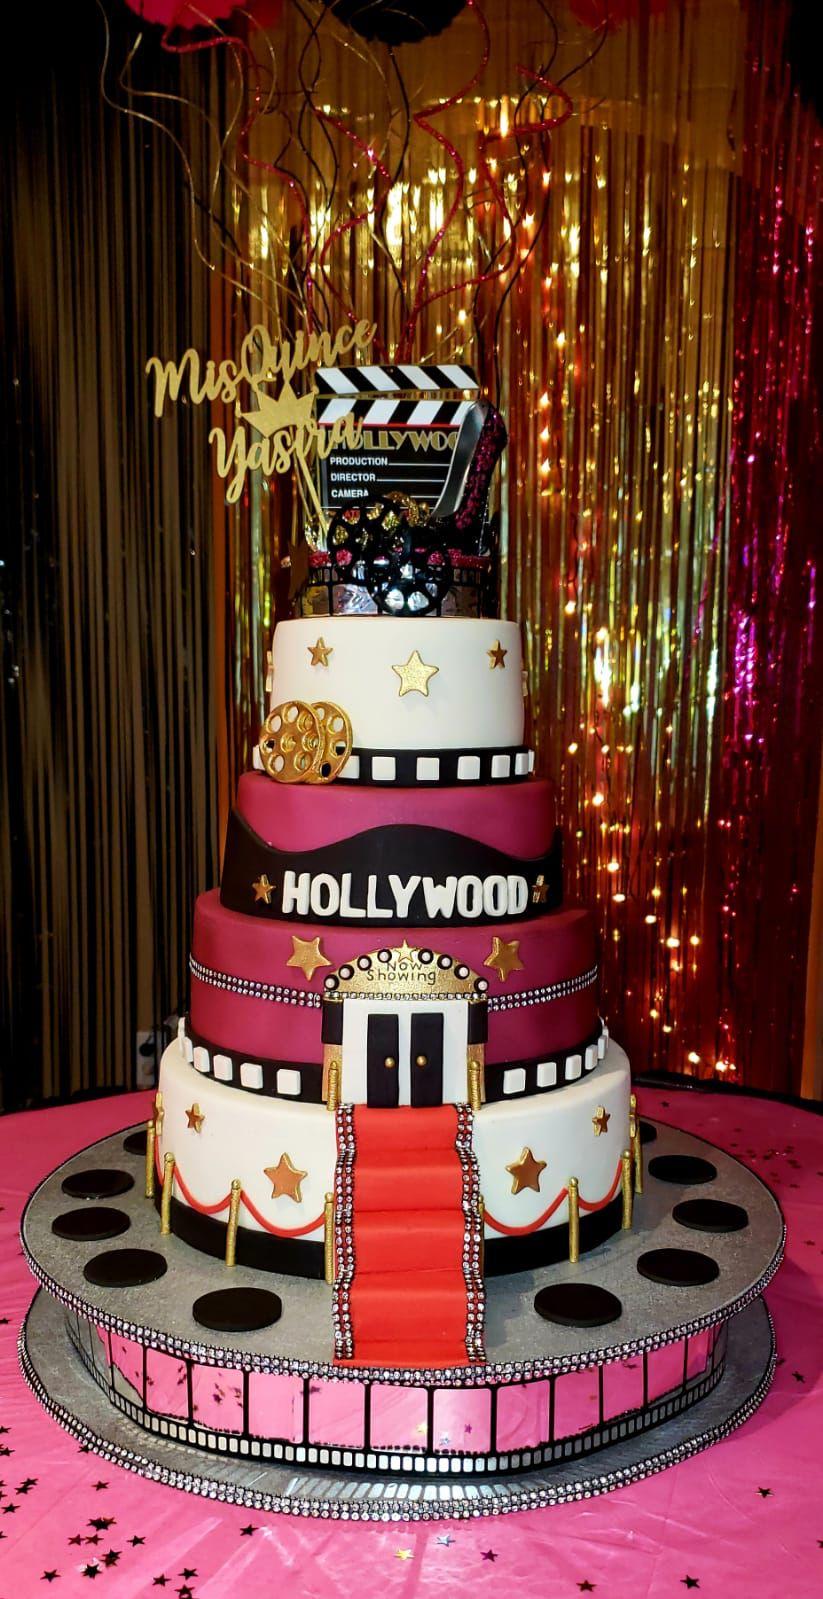 Tremendous Liz Custom Cakes Facebook Com Lizcustomcakes Apopka Fl 407 Funny Birthday Cards Online Elaedamsfinfo